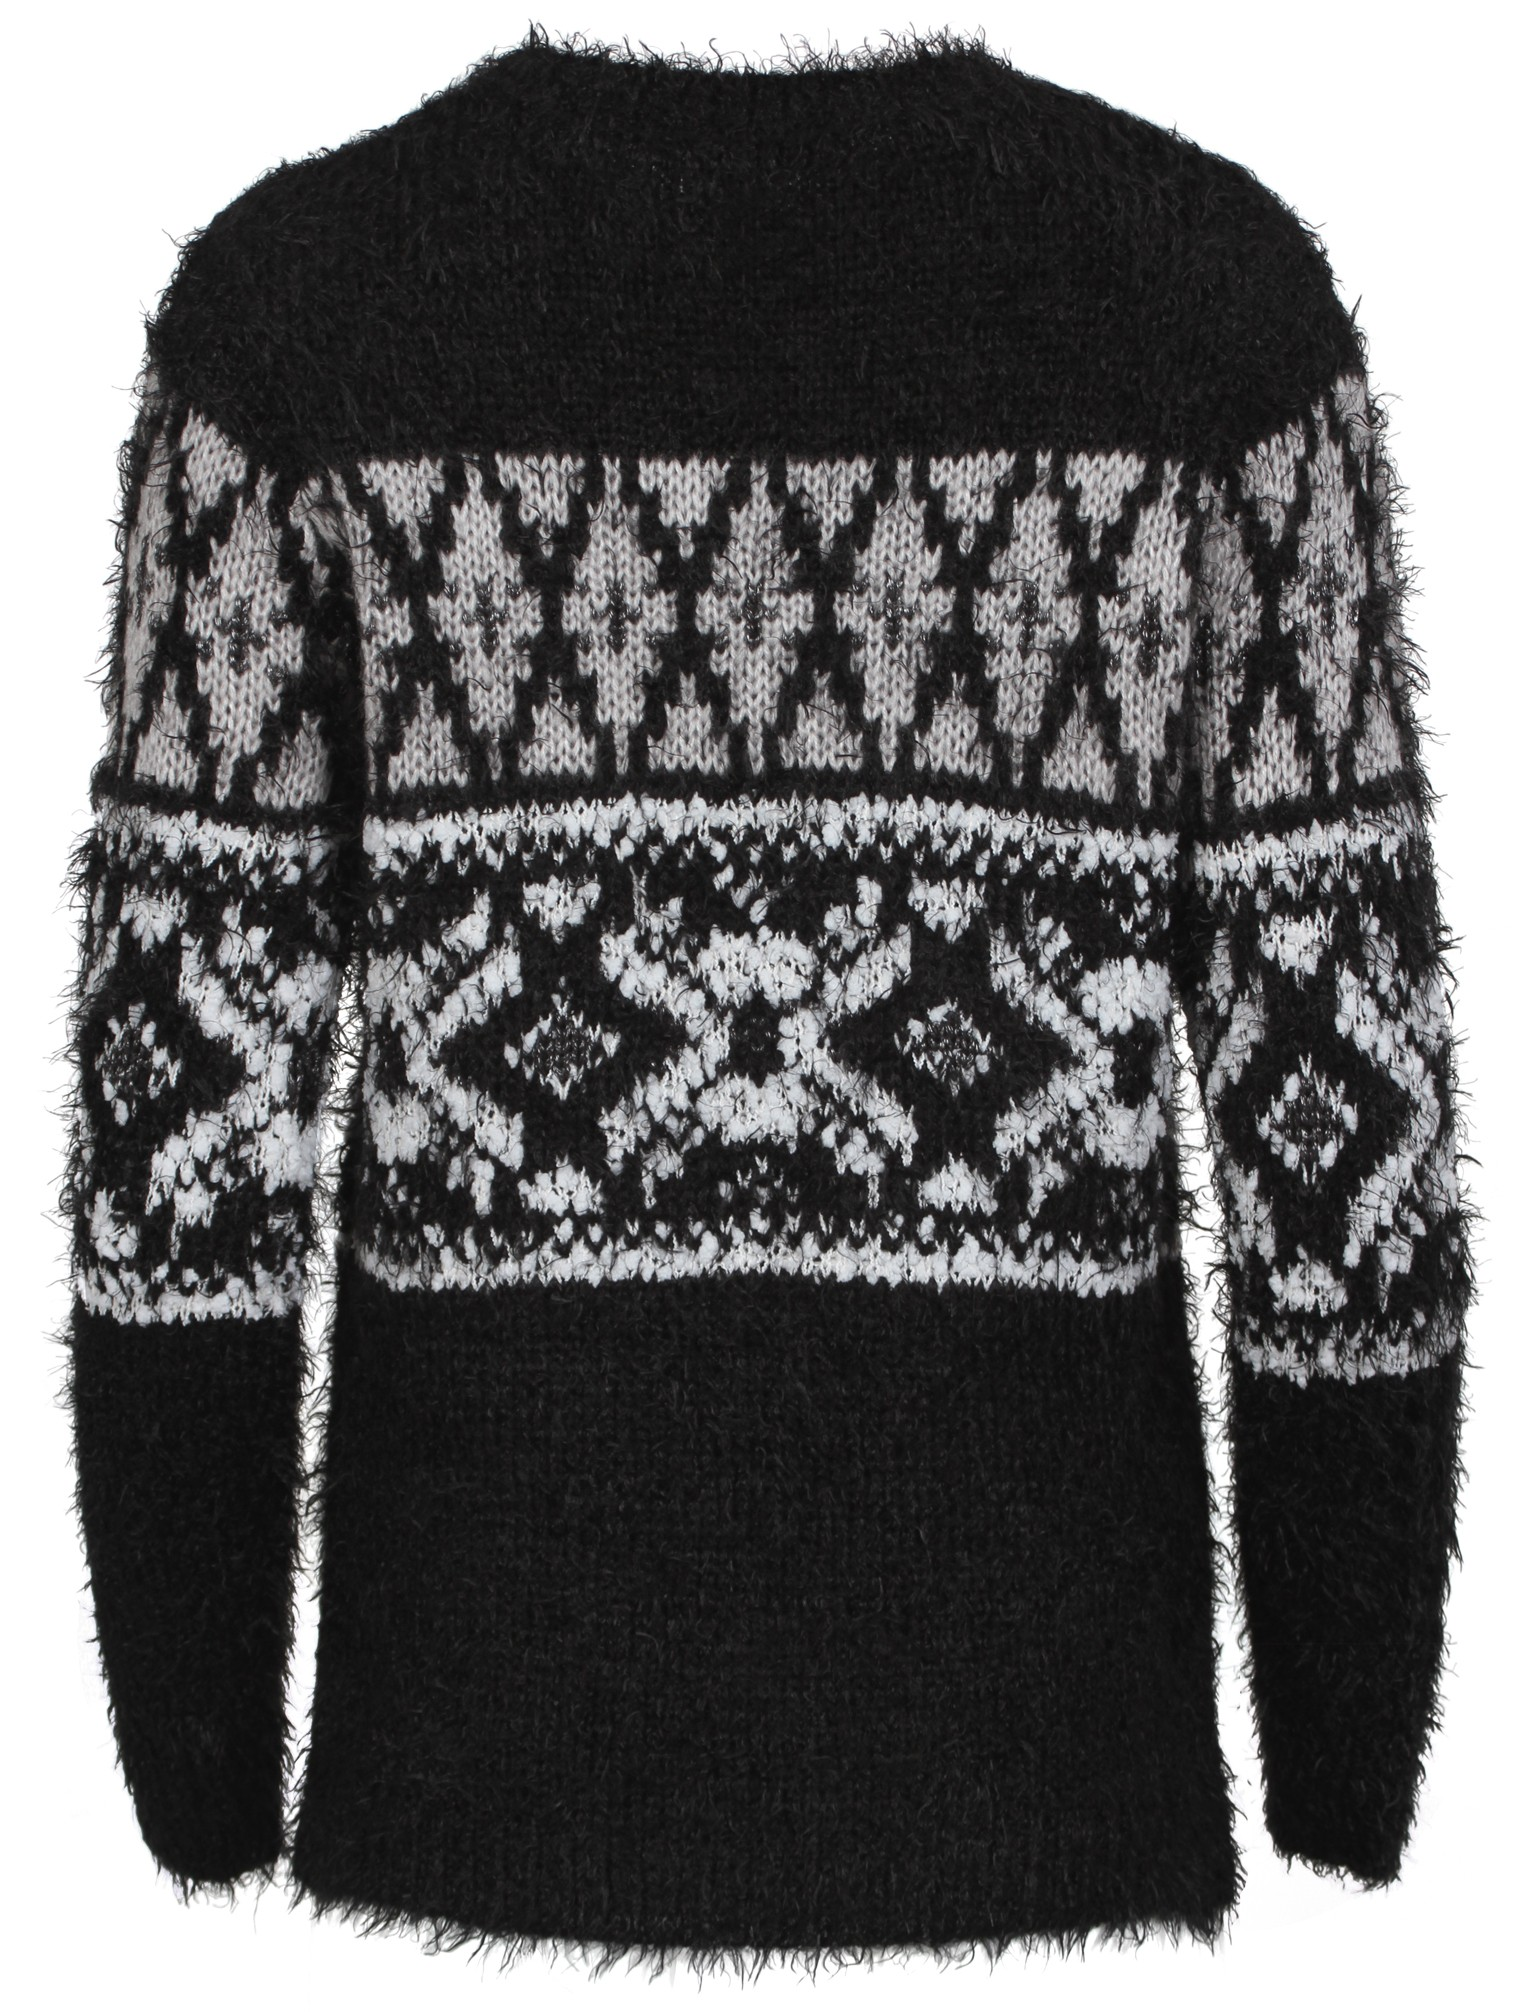 Womens Amara Reya Popsi Fairisle Knitted Ladies Jumper Long Sleeve Top Size 8-16